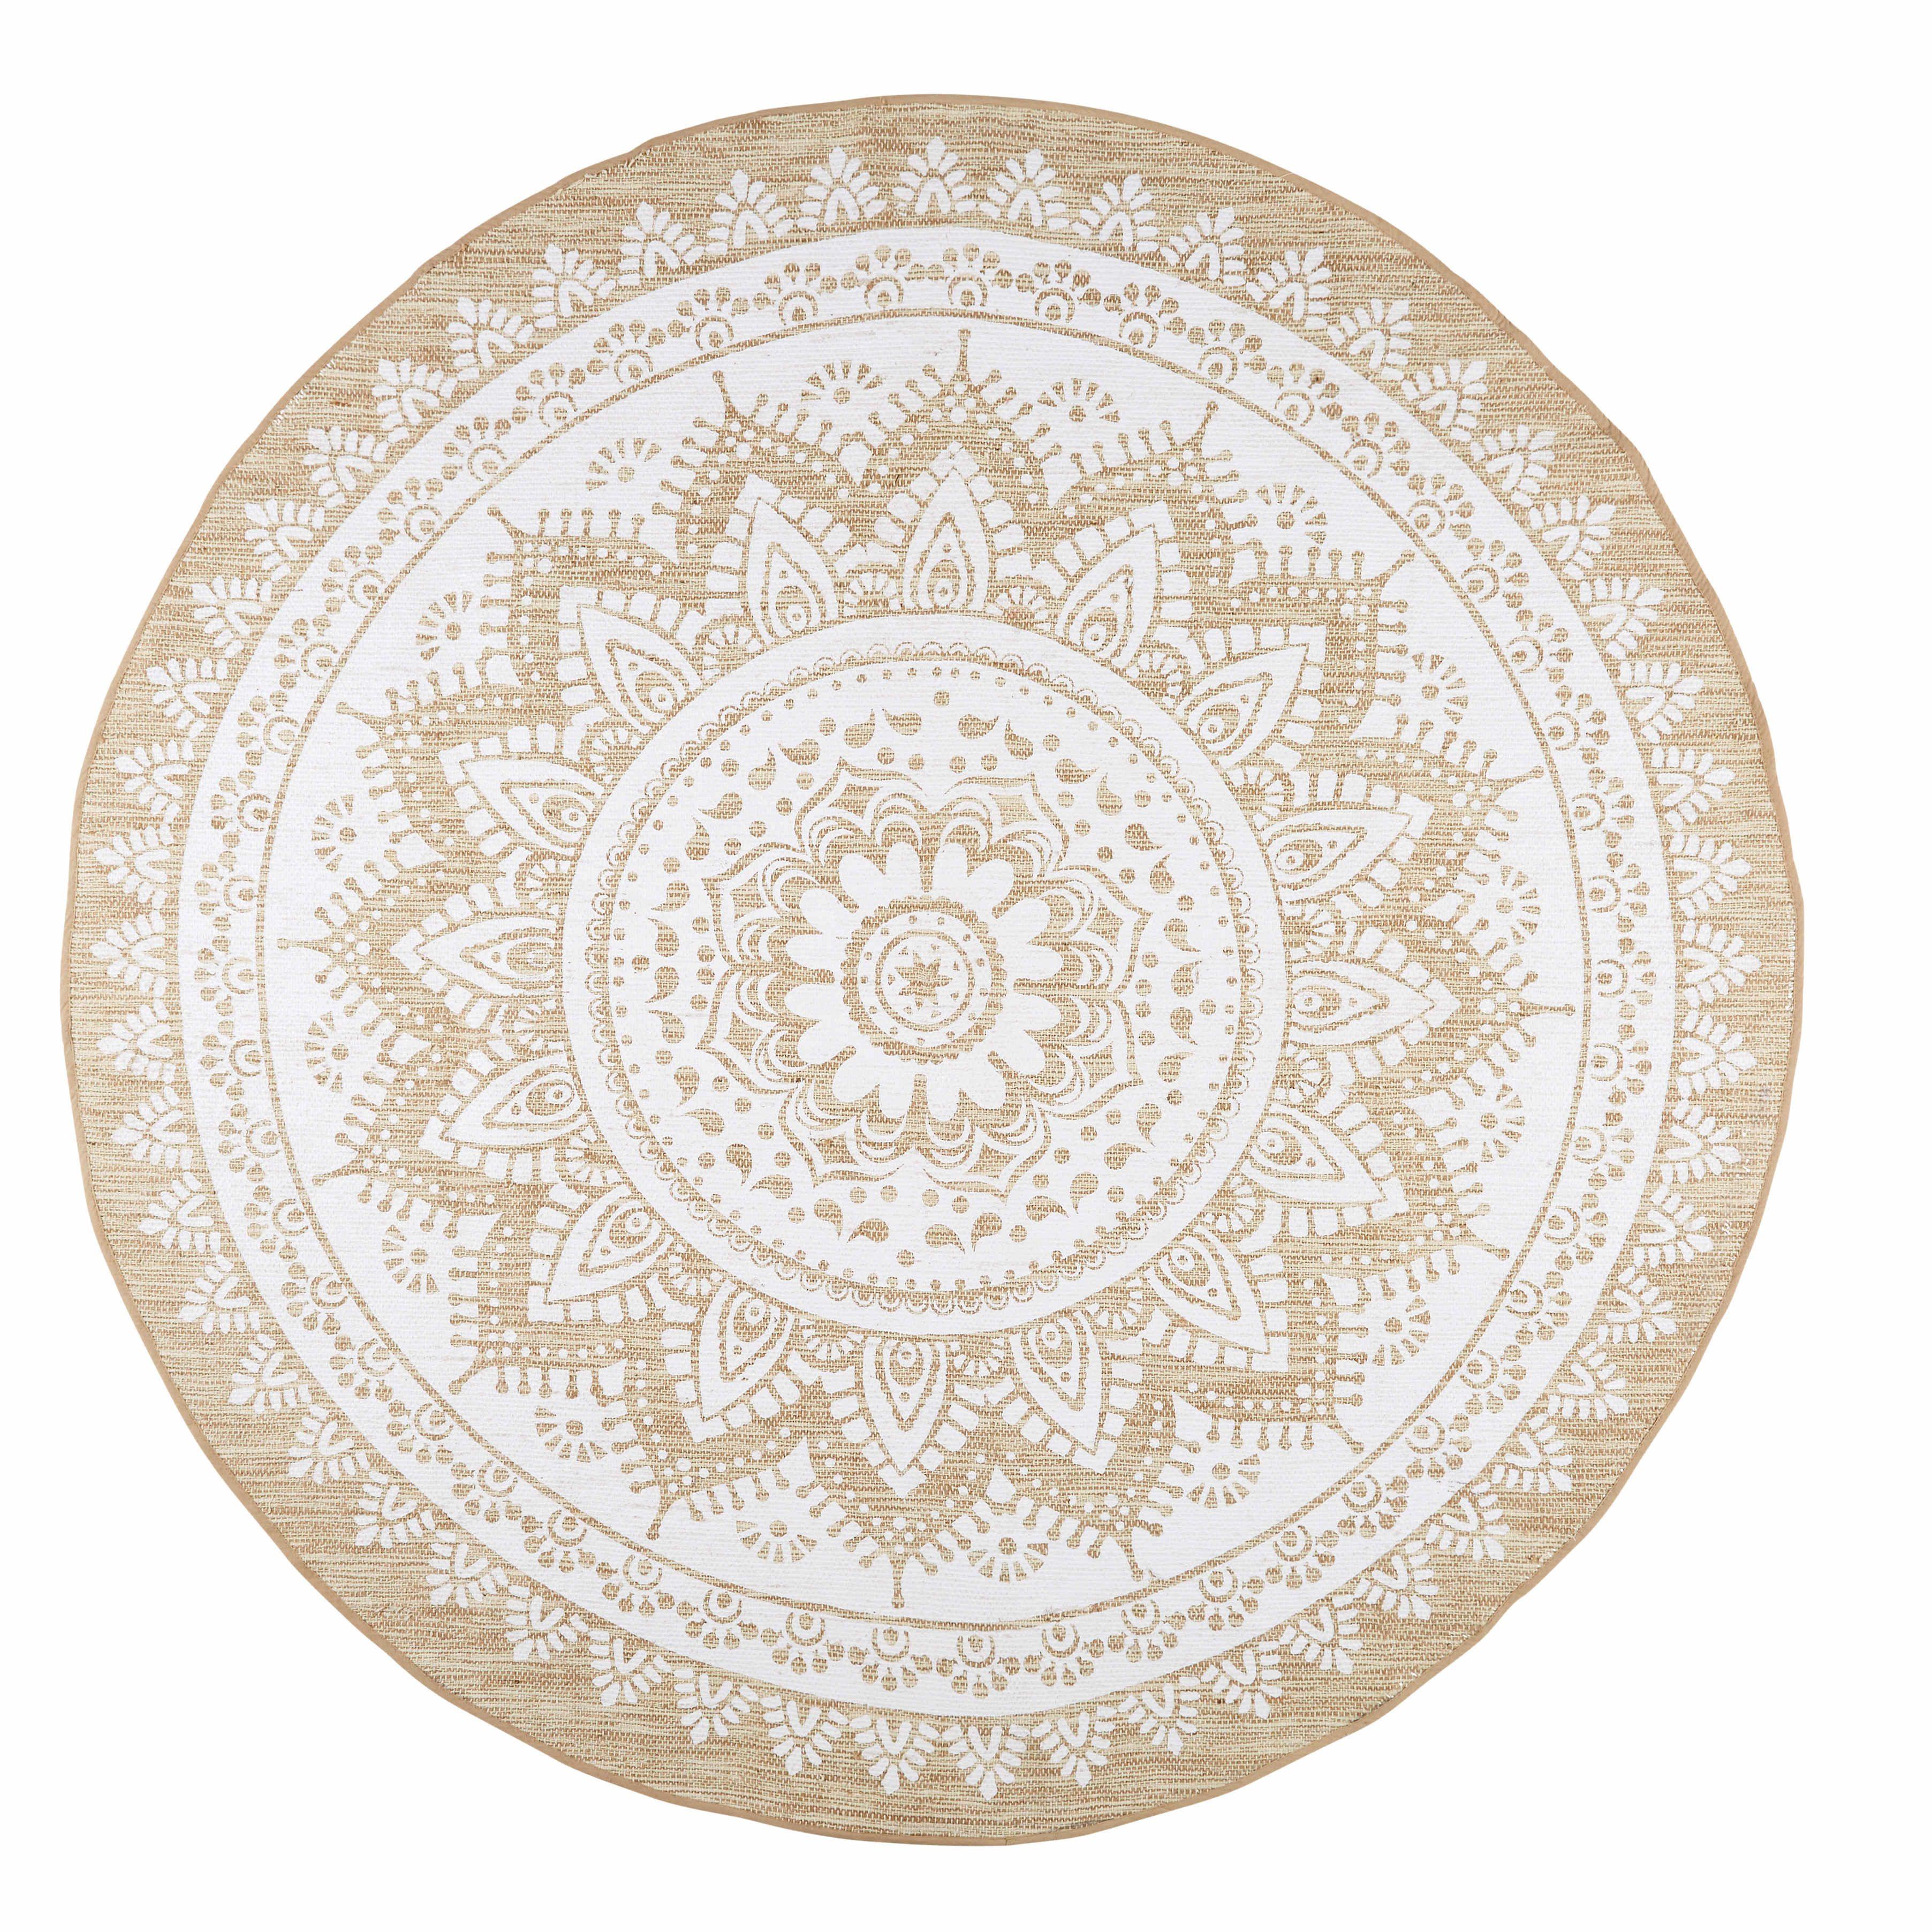 Tapis en jute et coton blanc D 180cm MANDALA